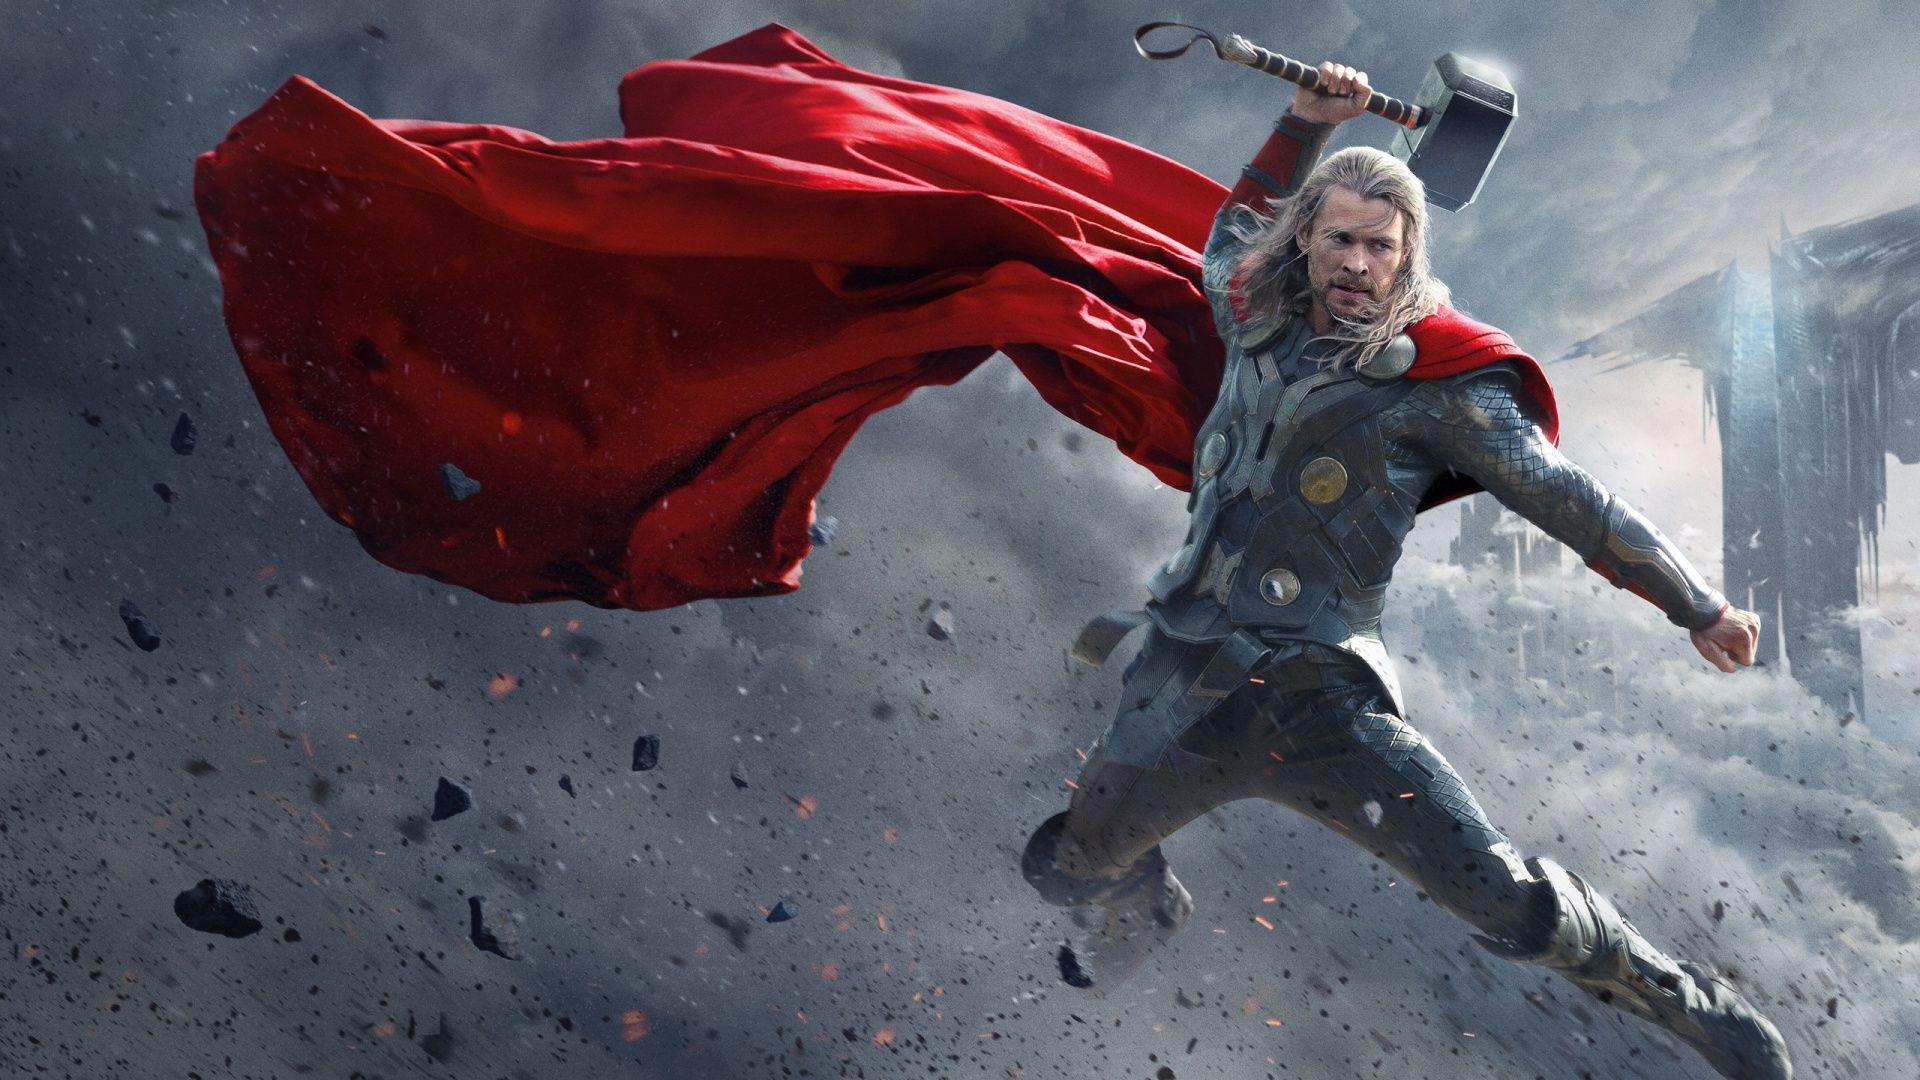 40 Free Thor Wallpaper Hd For Desktop The Dark World Thor